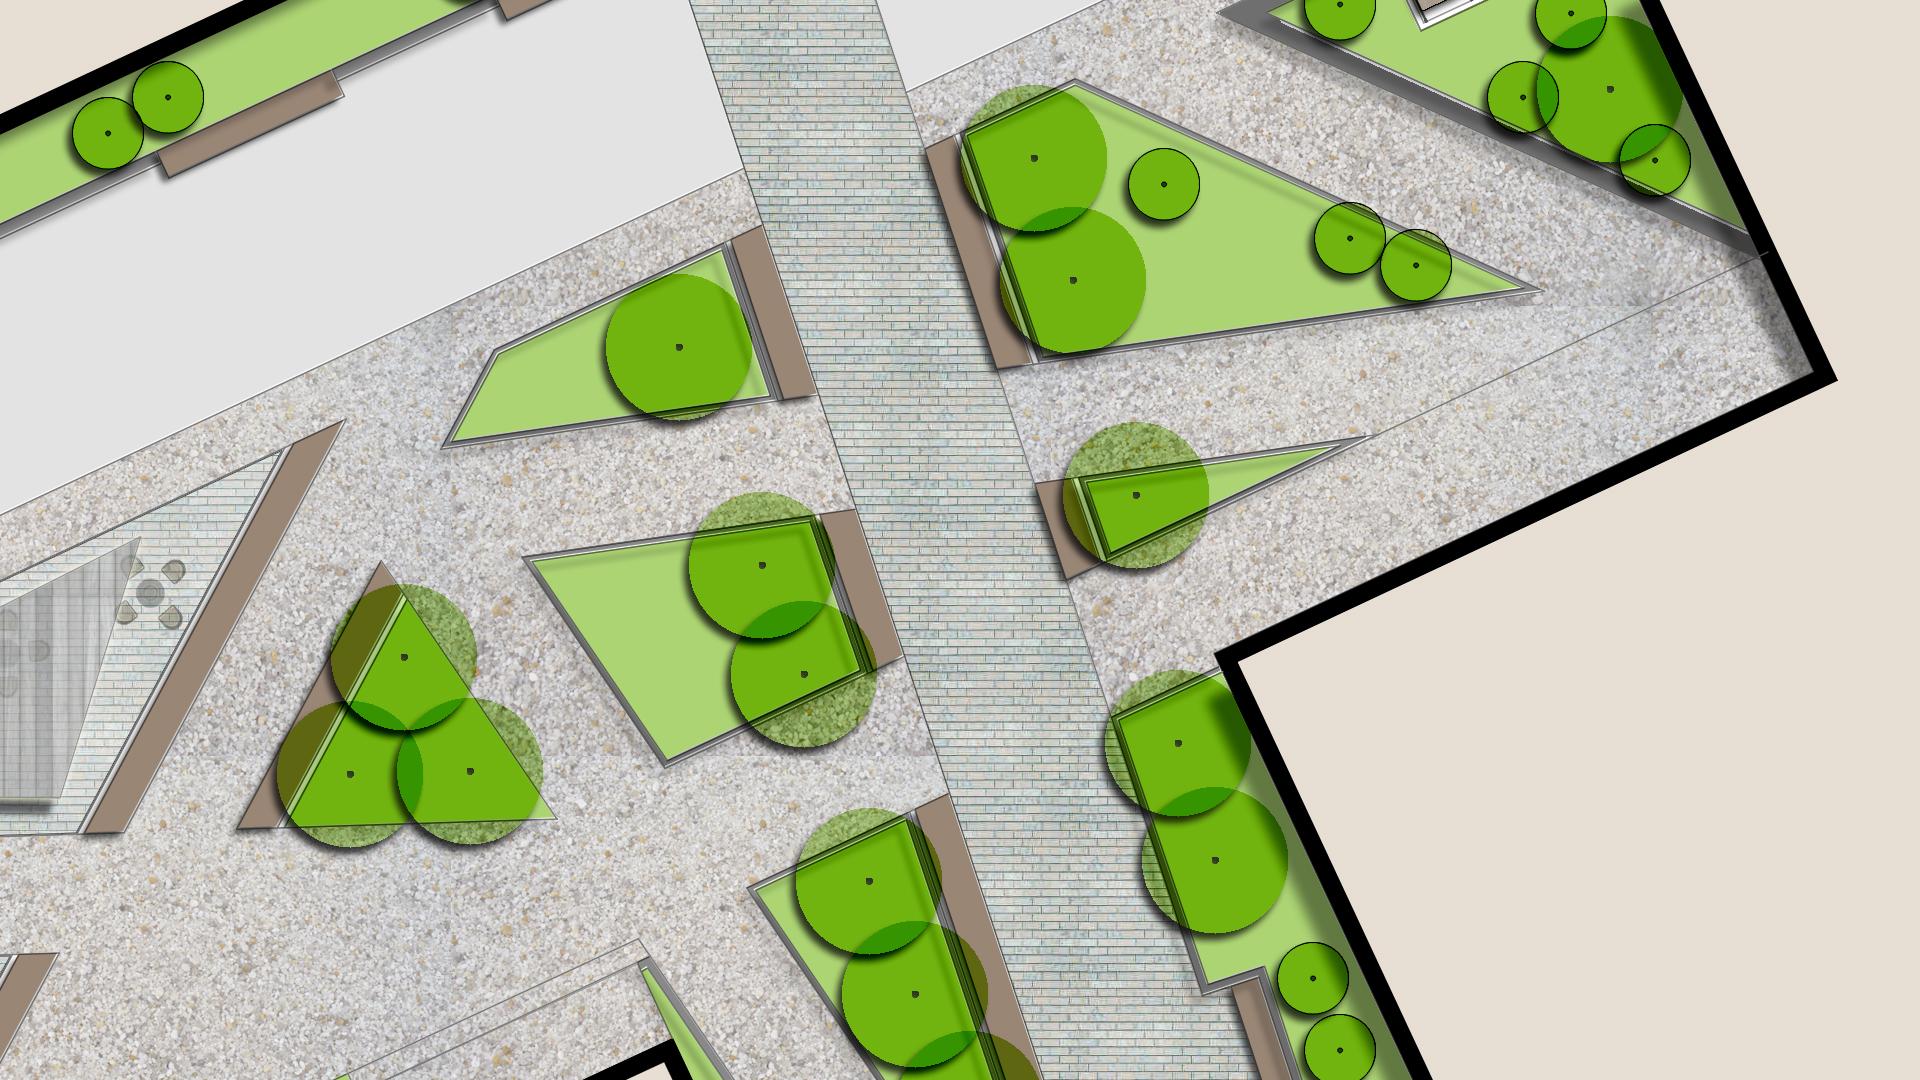 School campus design concept landscape architects urban for School landscape design